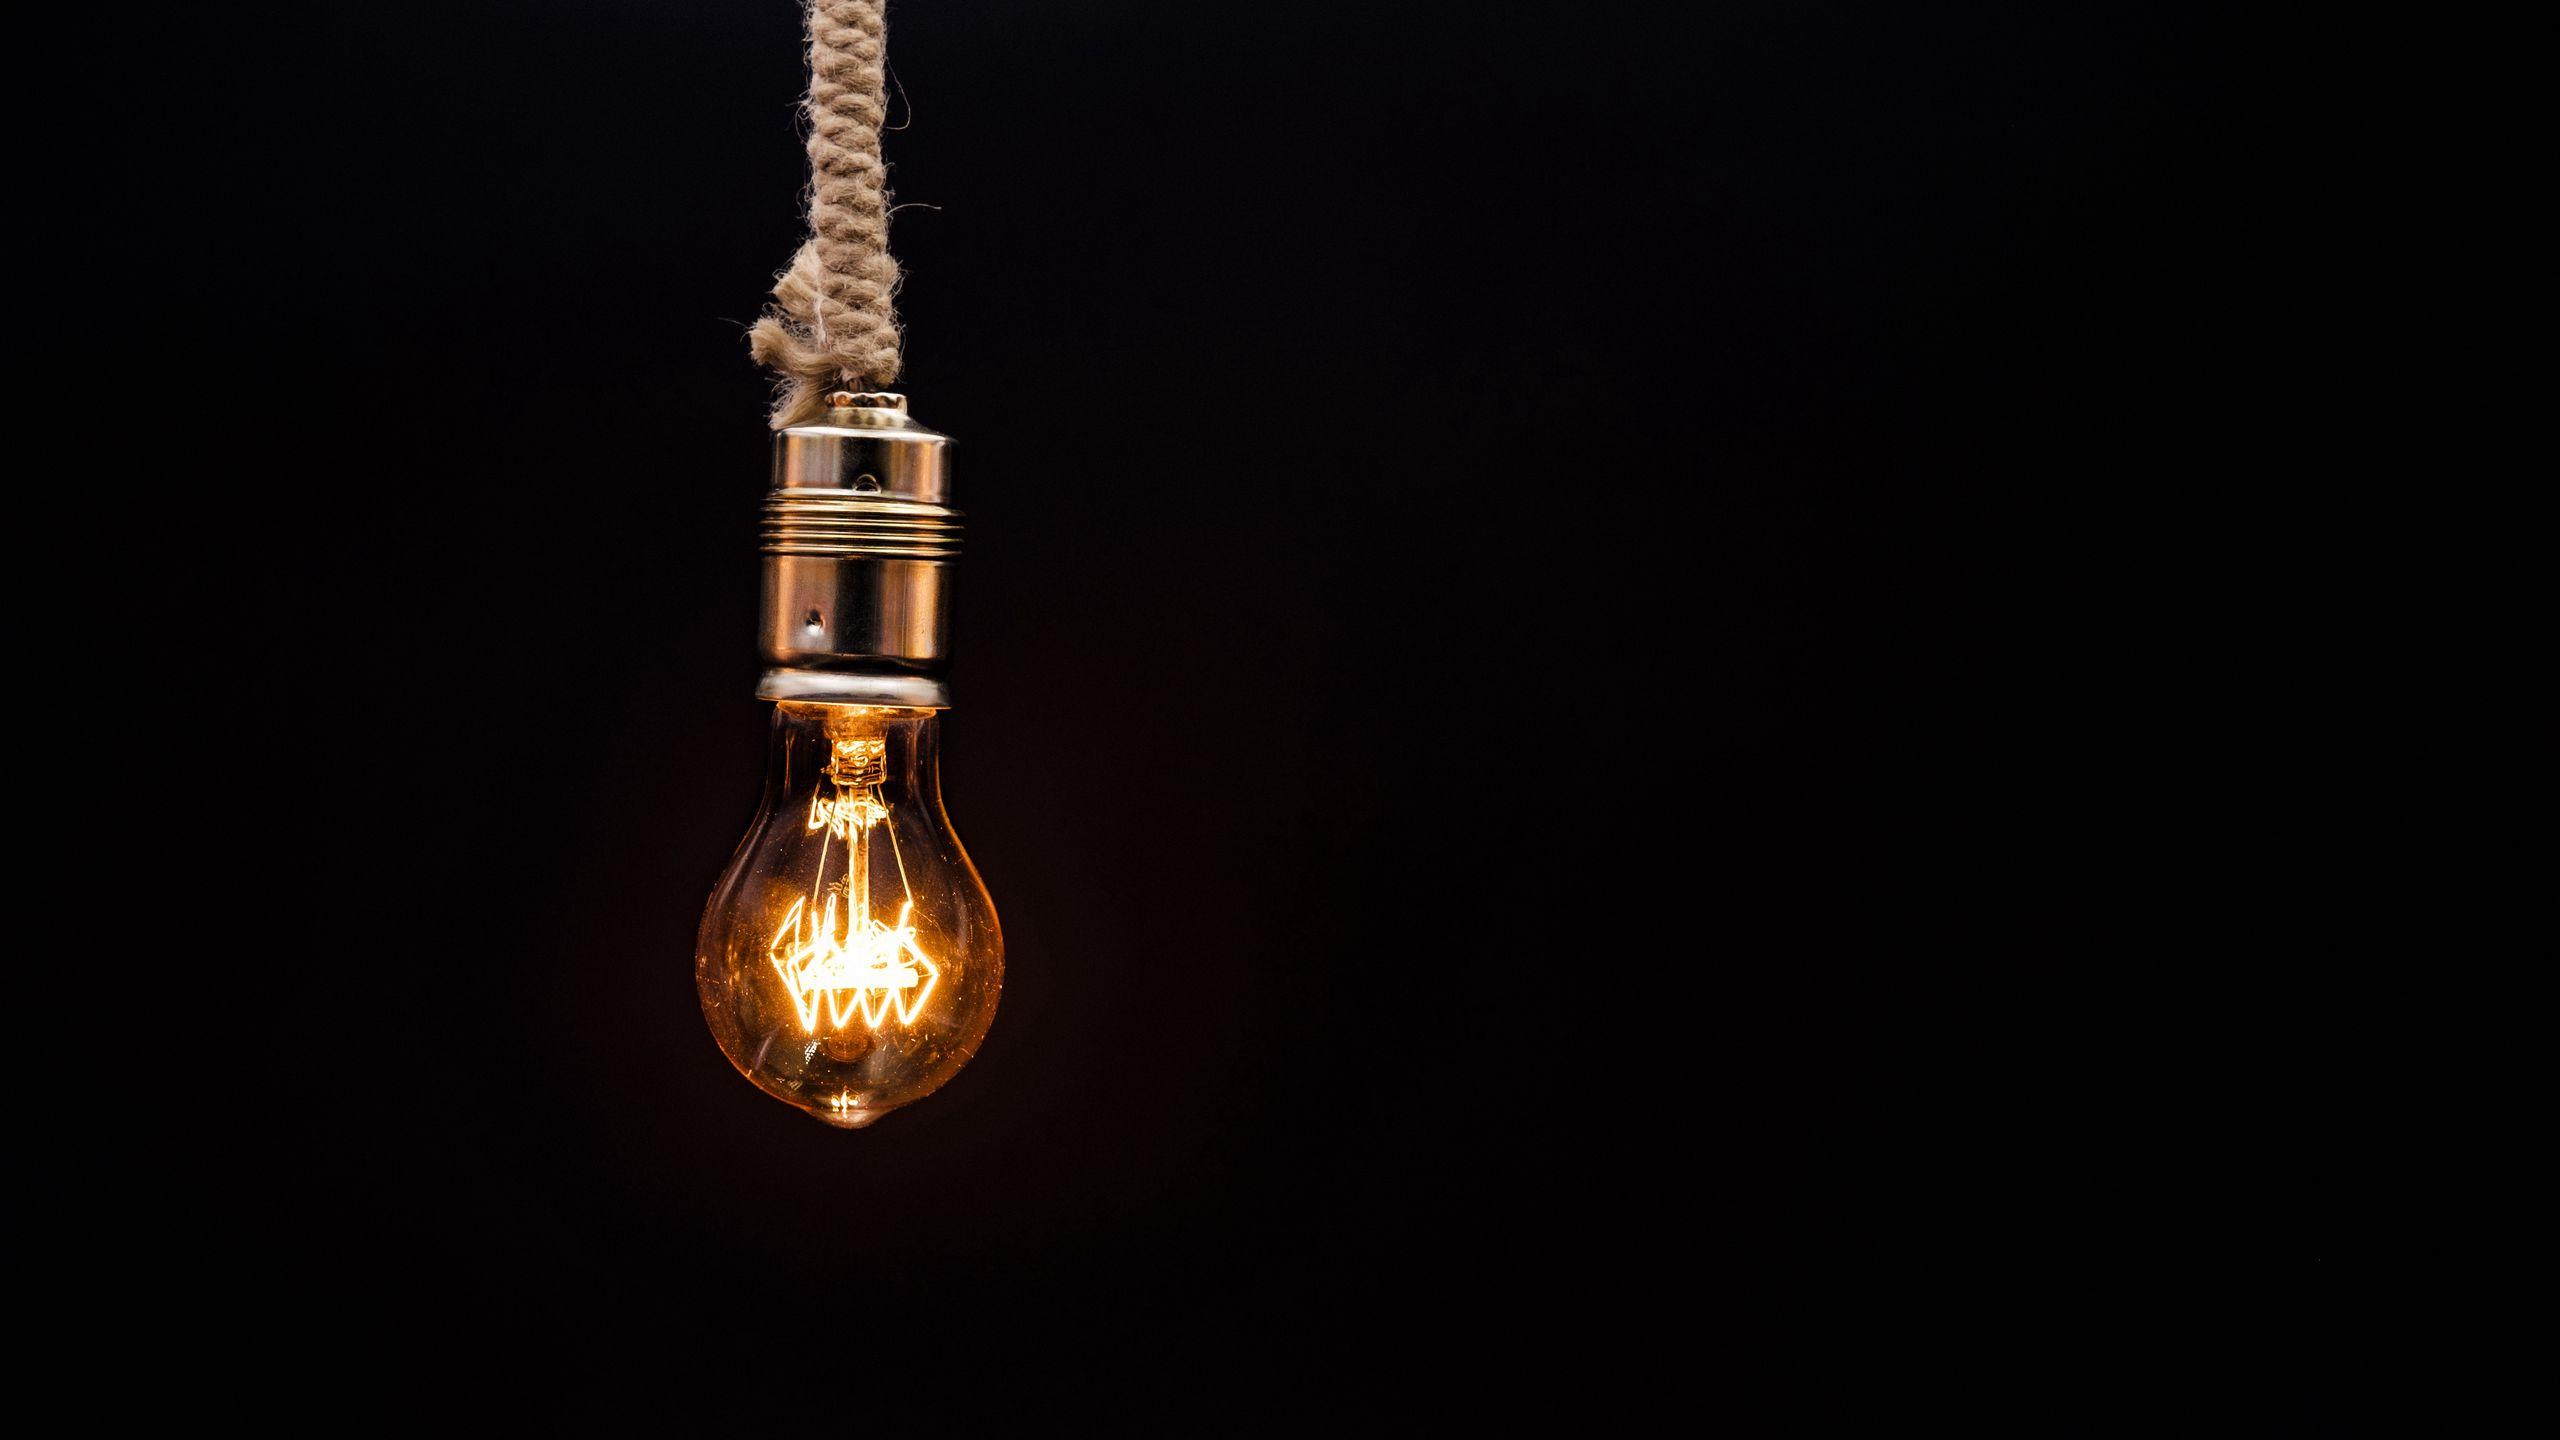 2560x1440 Wallpaper bulb, lighting, rope, electricity, edisons lamp